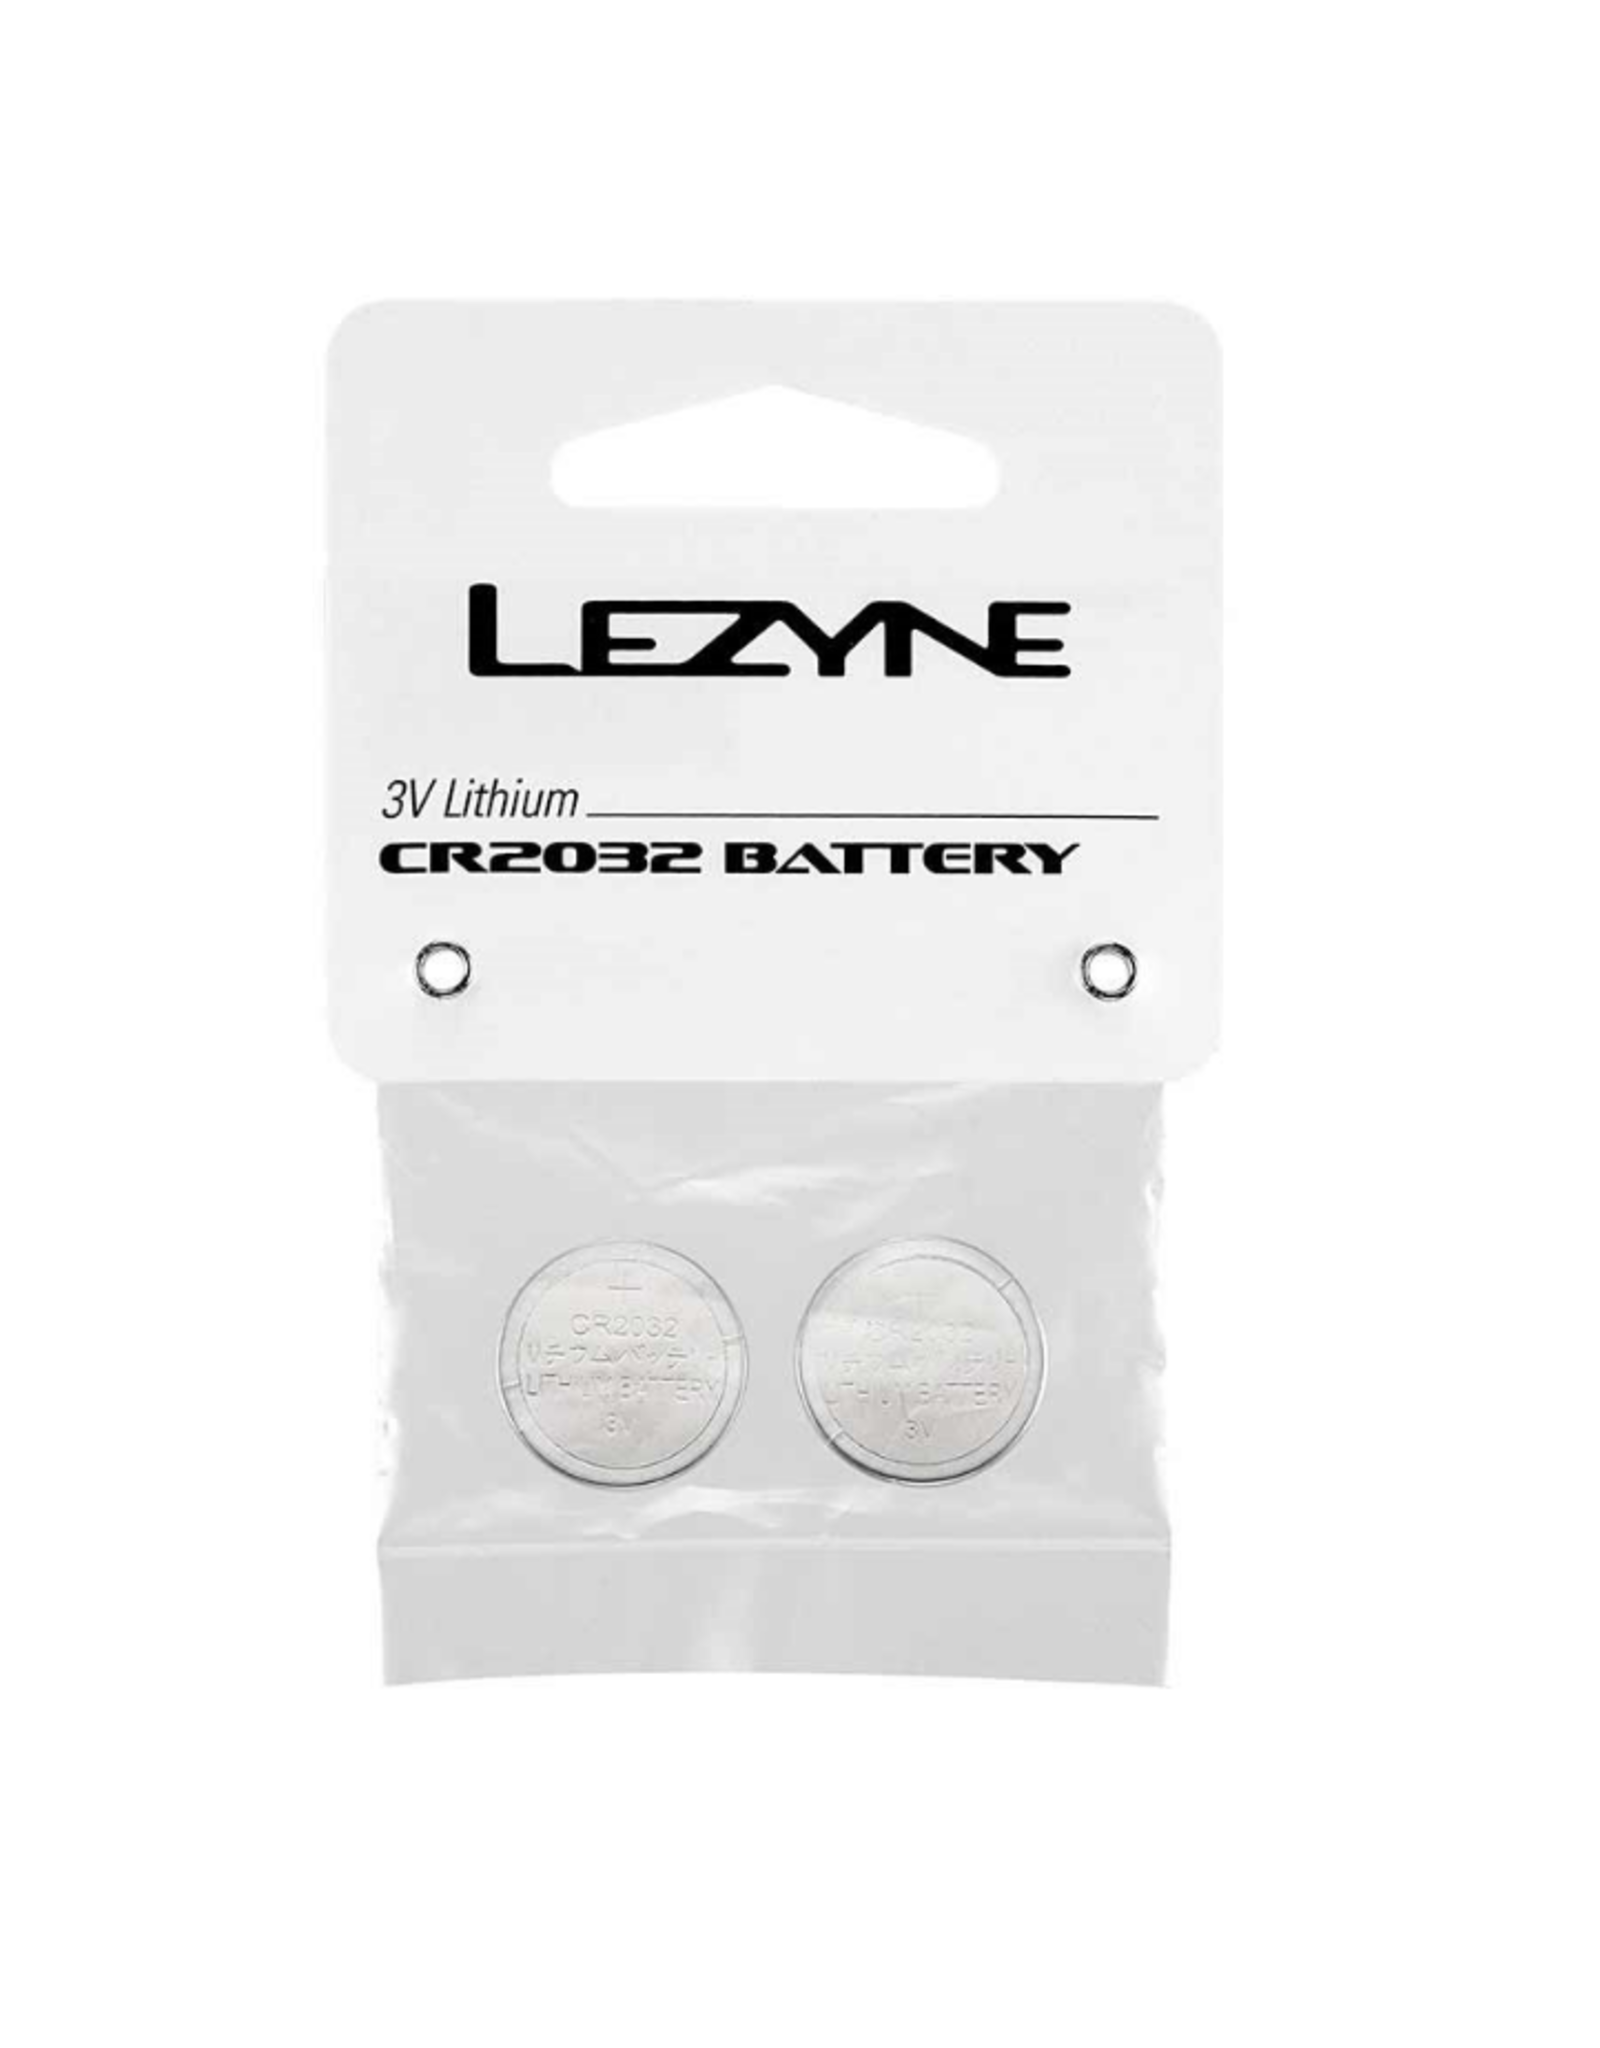 Lezyne Batteries, Pair - Lezyne CR2032 Batteries 2pcs